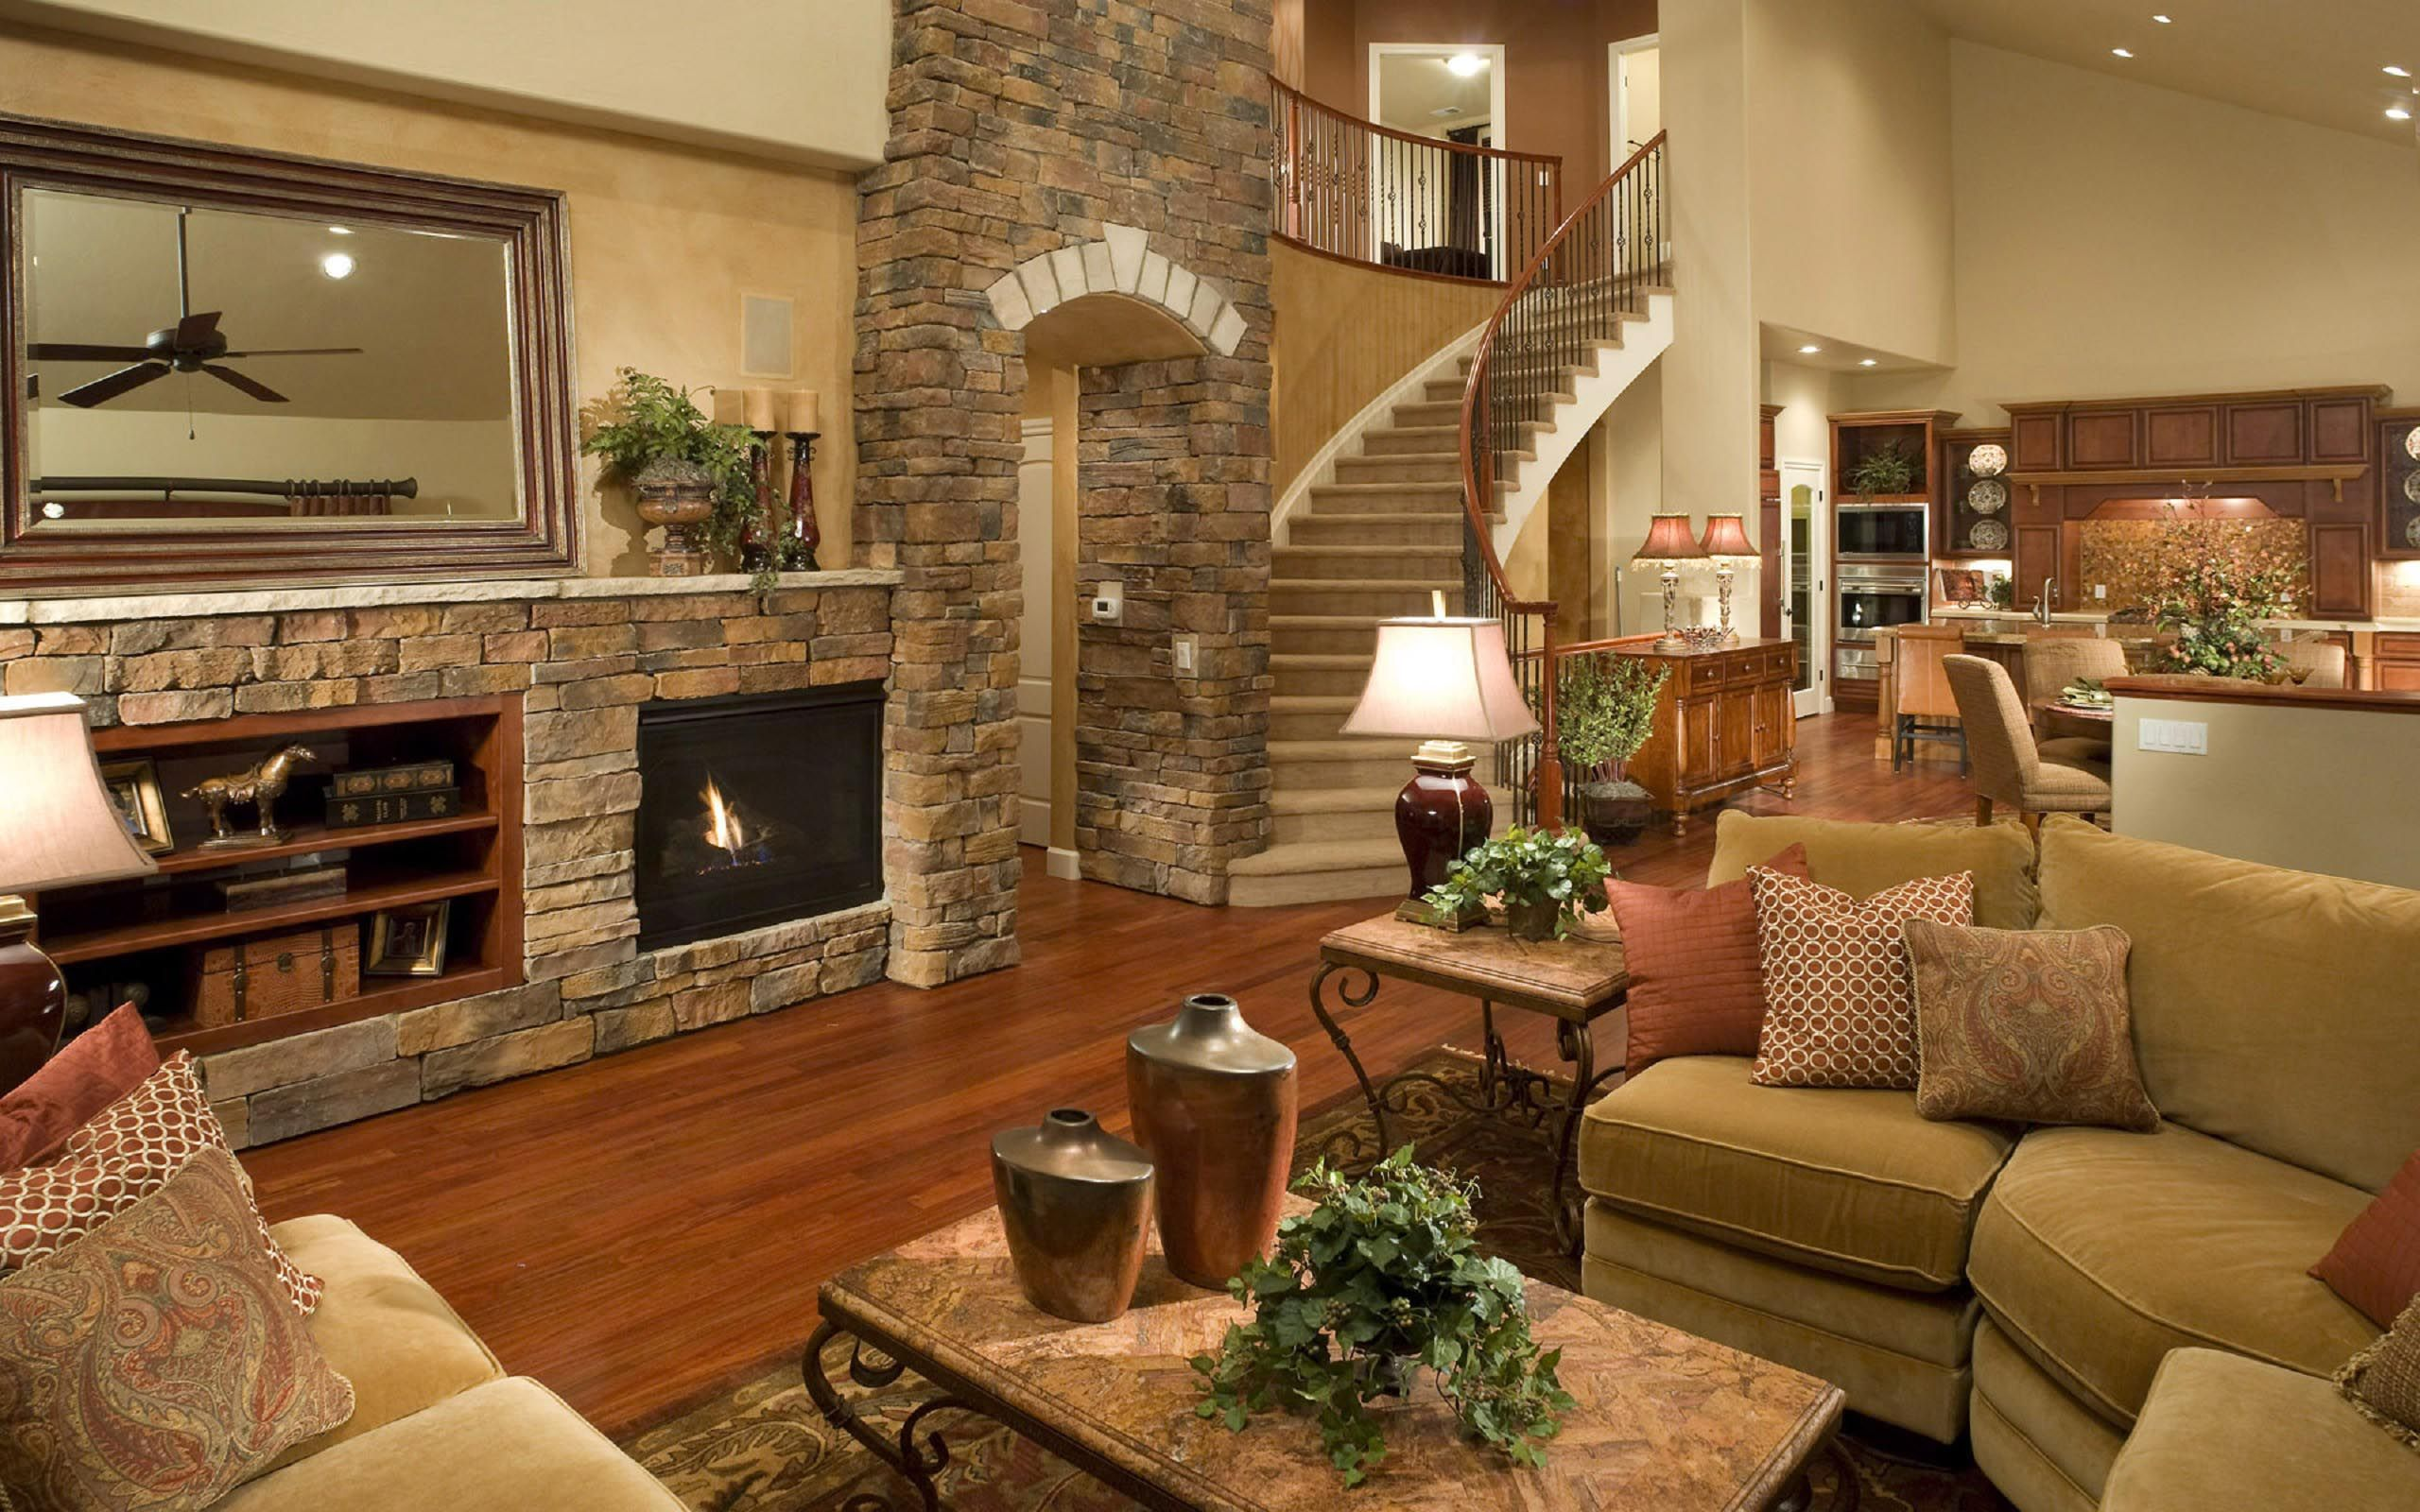 Great Home Decor Ideas Beautiful Houses Interior Beautiful Houses Inside Beautiful Living Rooms